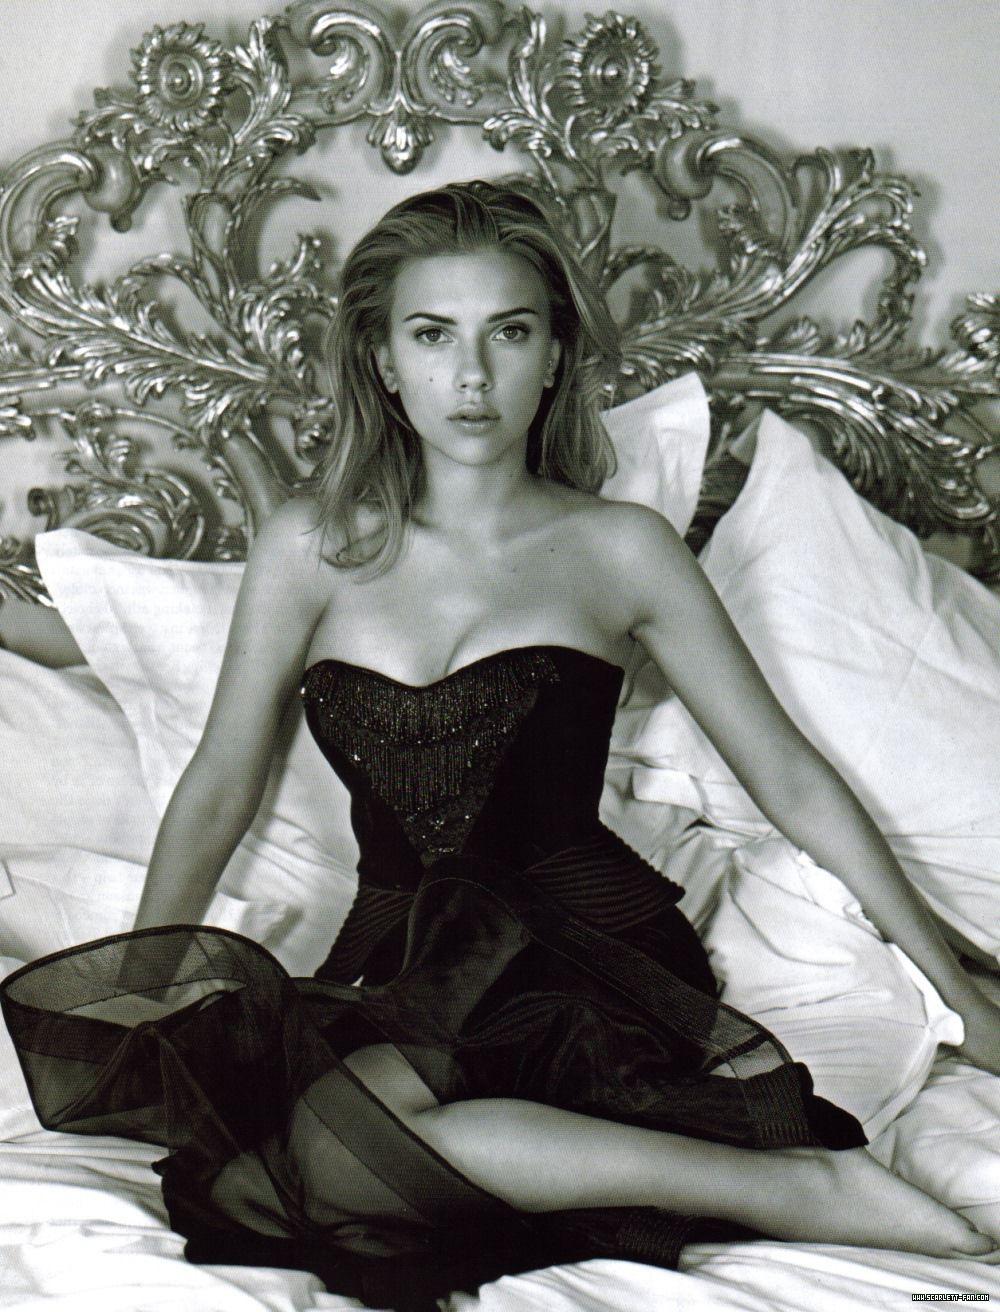 All carito fashion september 2012 - The Best Of Scarlett Johansson